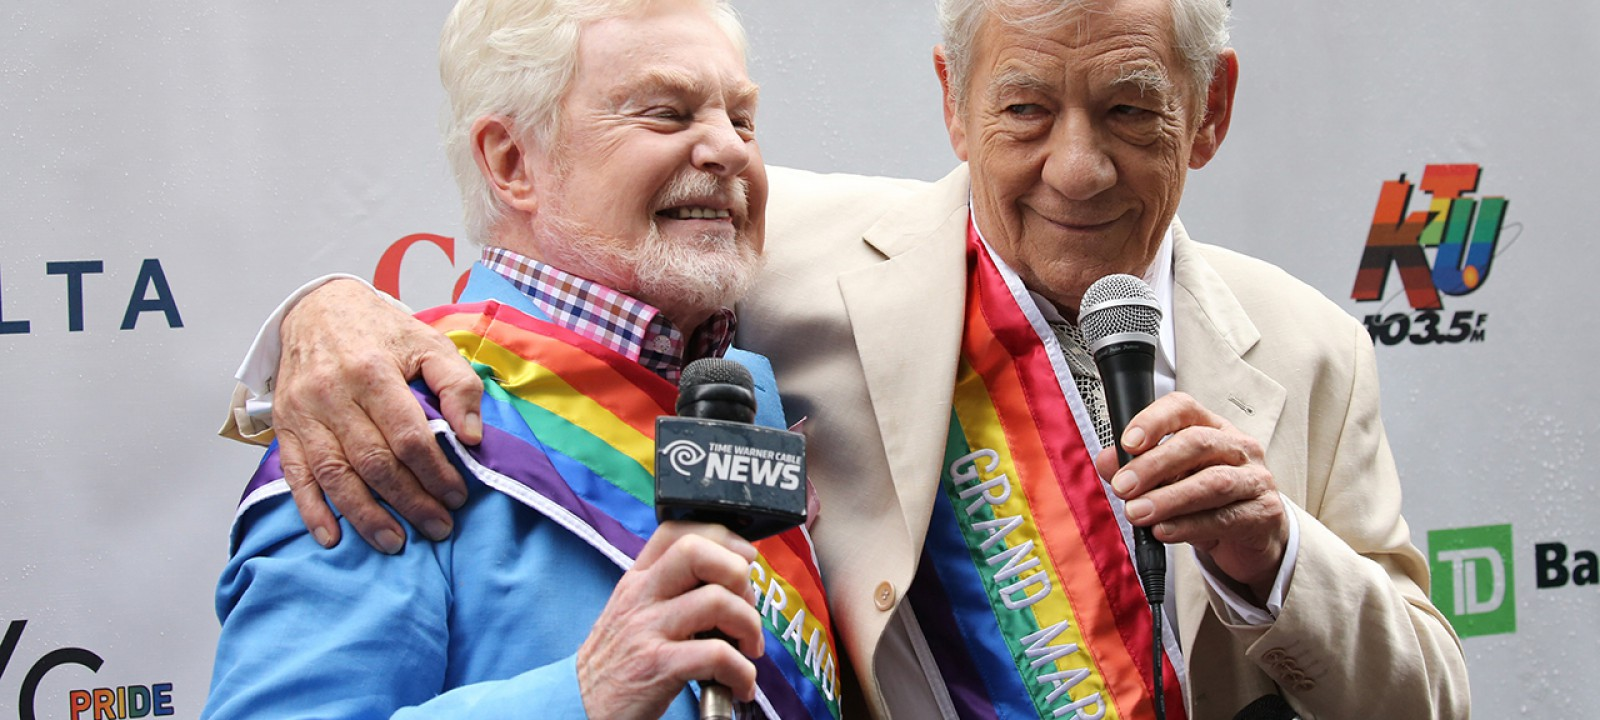 New York City Pride 2015 – March